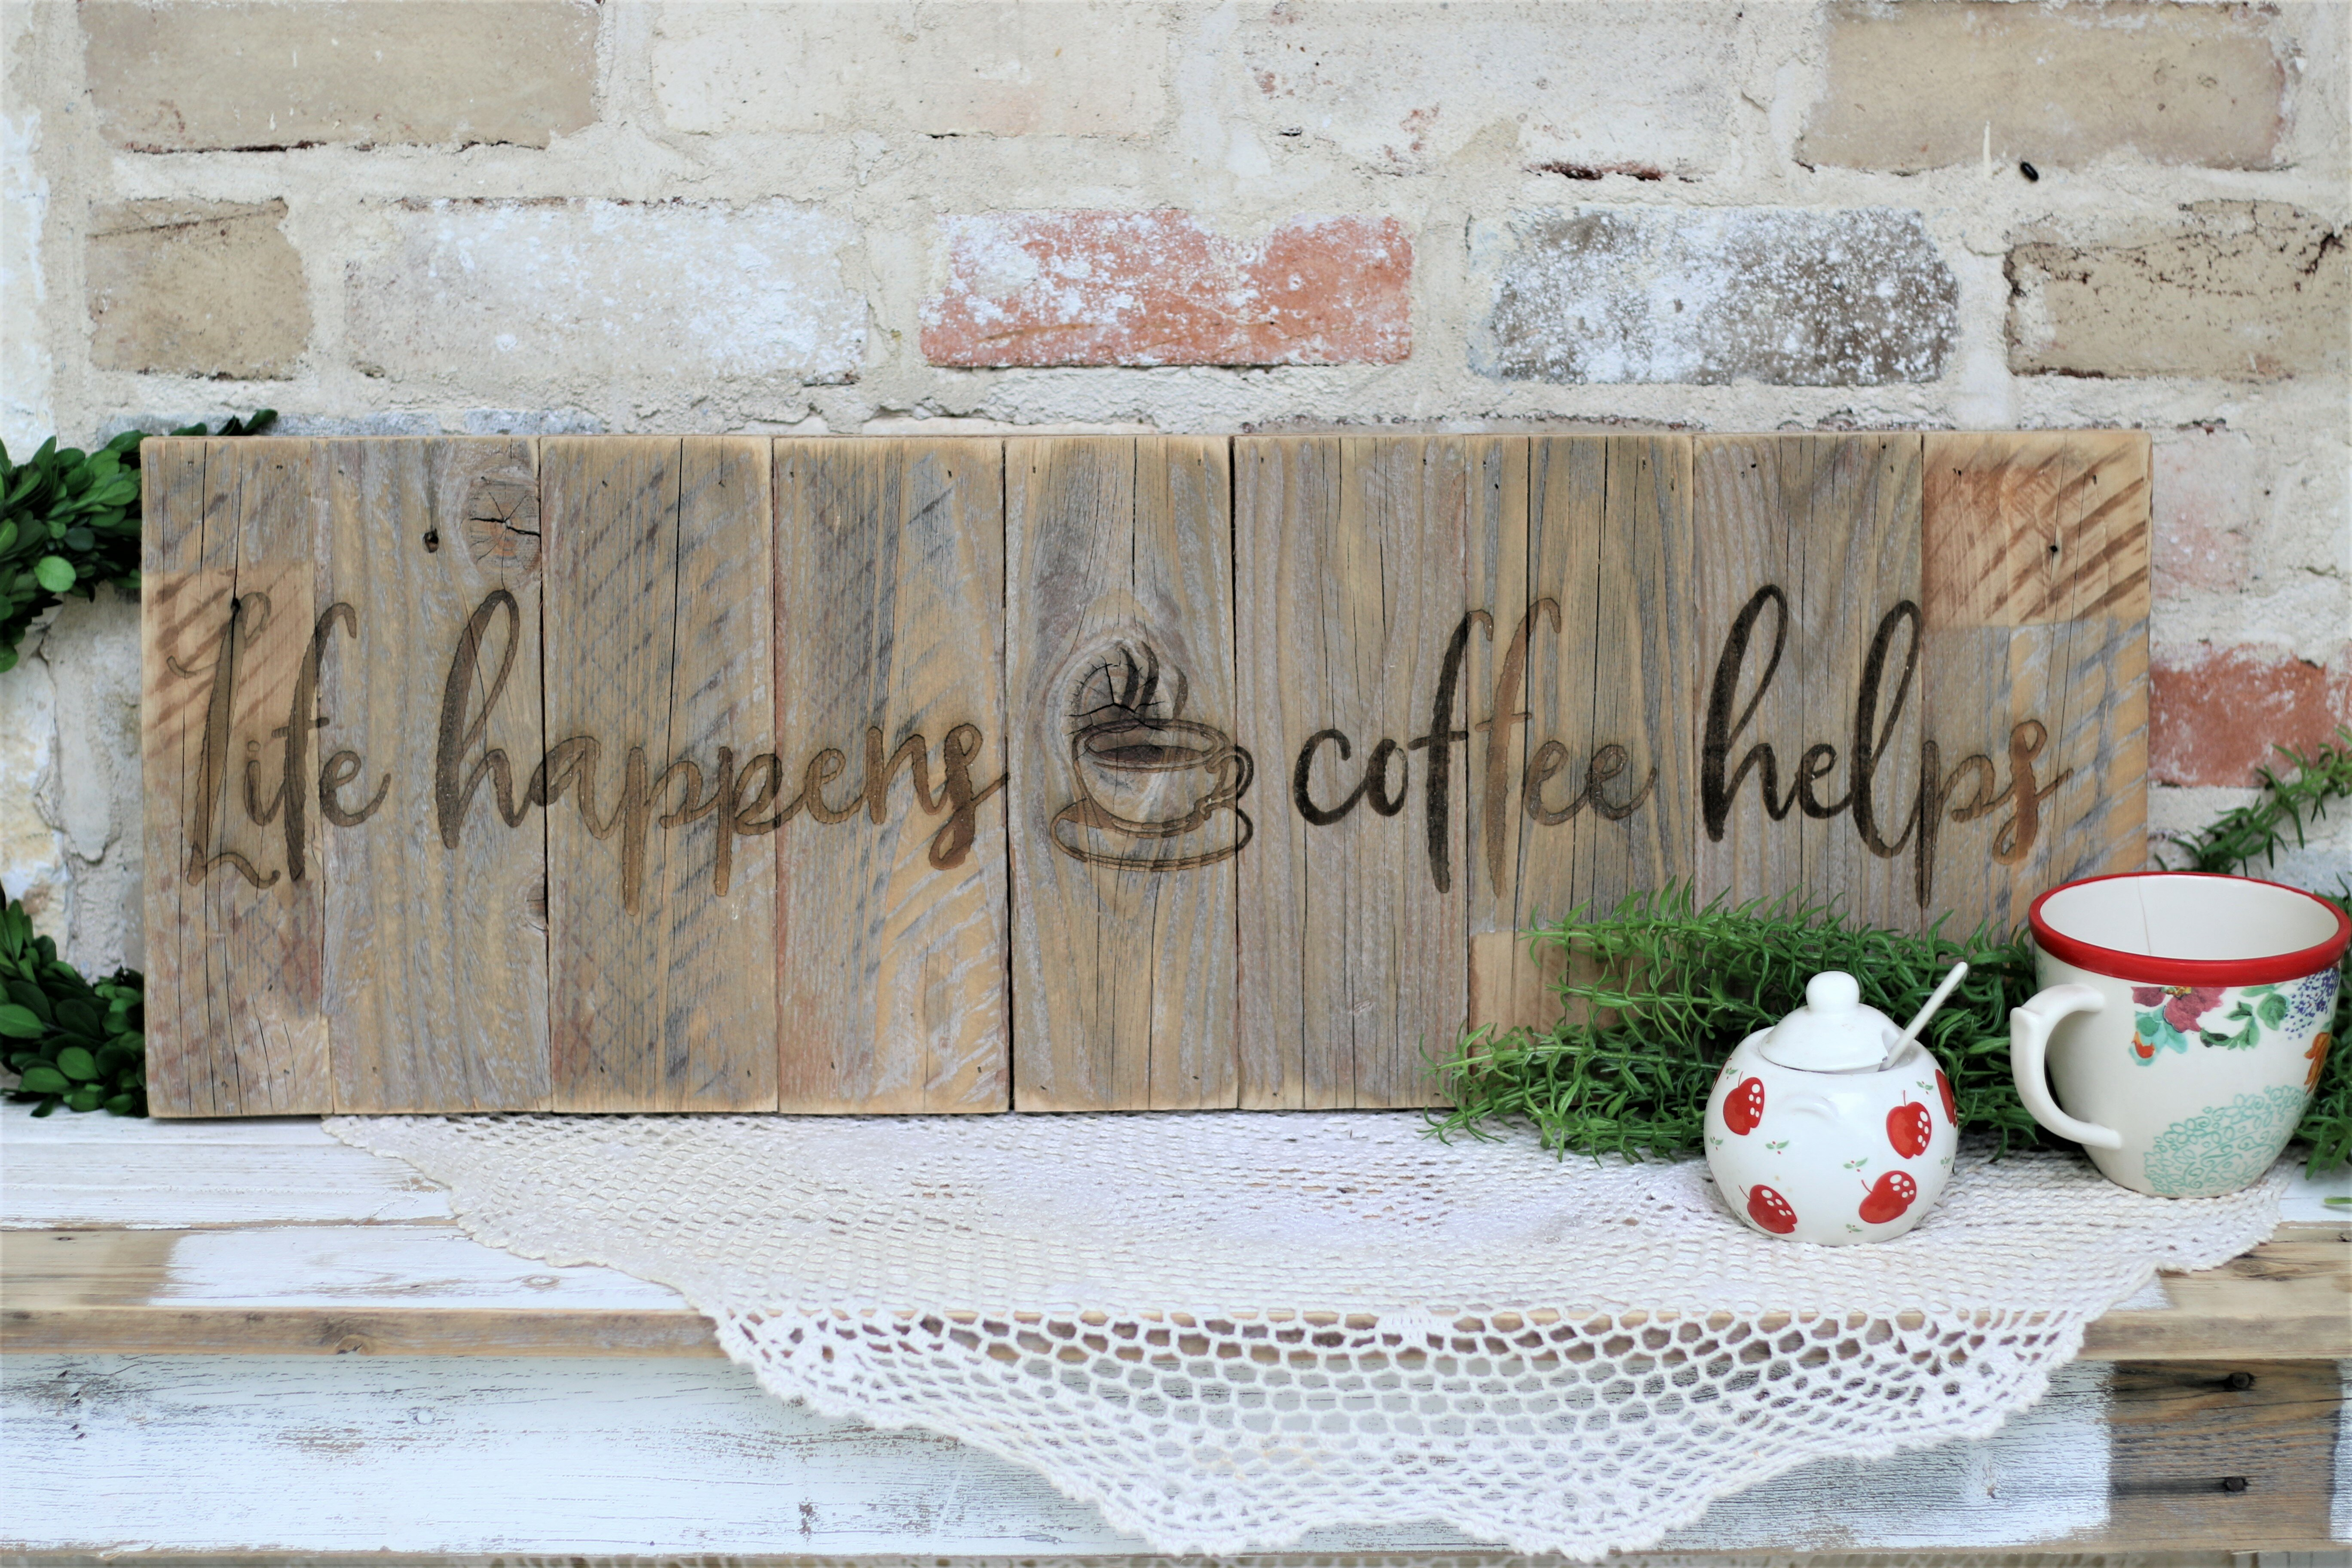 "Bar Rustic Farmhouse Wood Coffee Wall Decor Sign for Kitchen Barnyard Designs /'Ok Cafe 24/"" x 8.5/"" Display Rack But First Coffee/' Mug Holder"